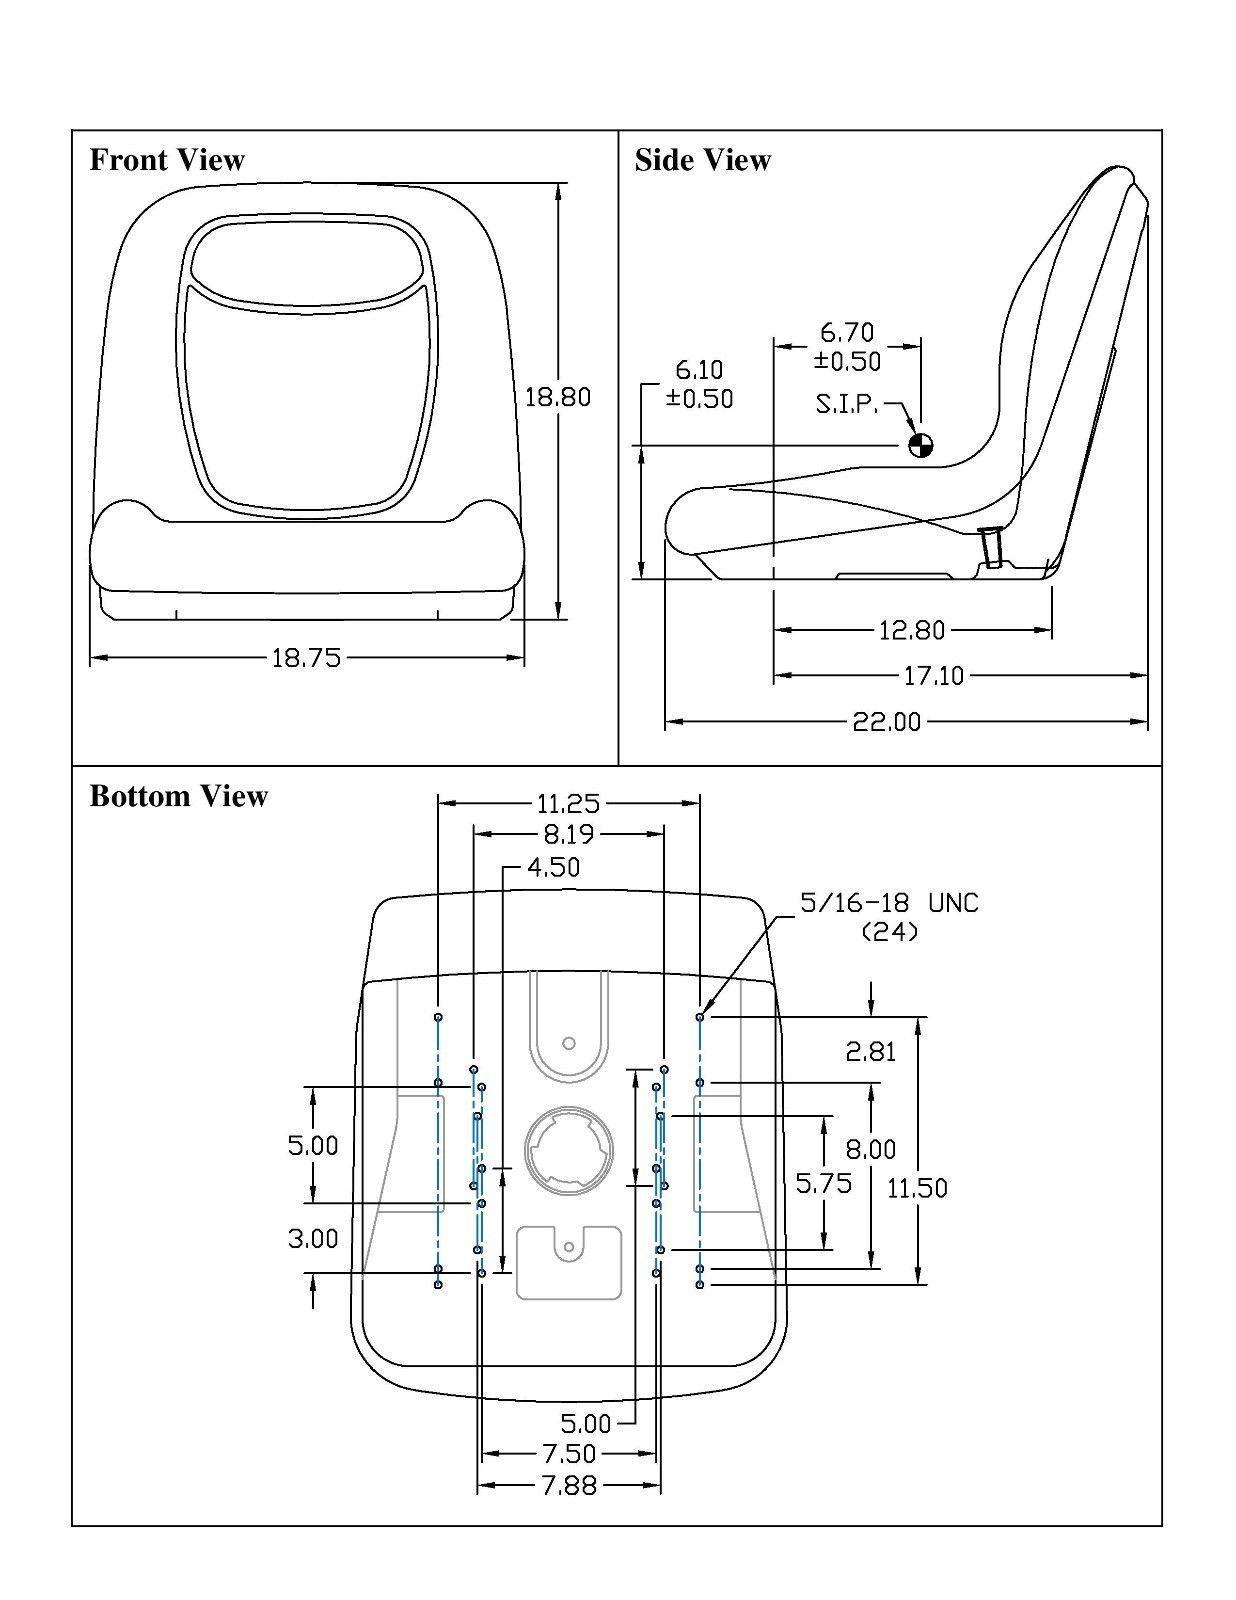 Wiring Diagram For Bad Boy Mower | Wiring Diagram Database on